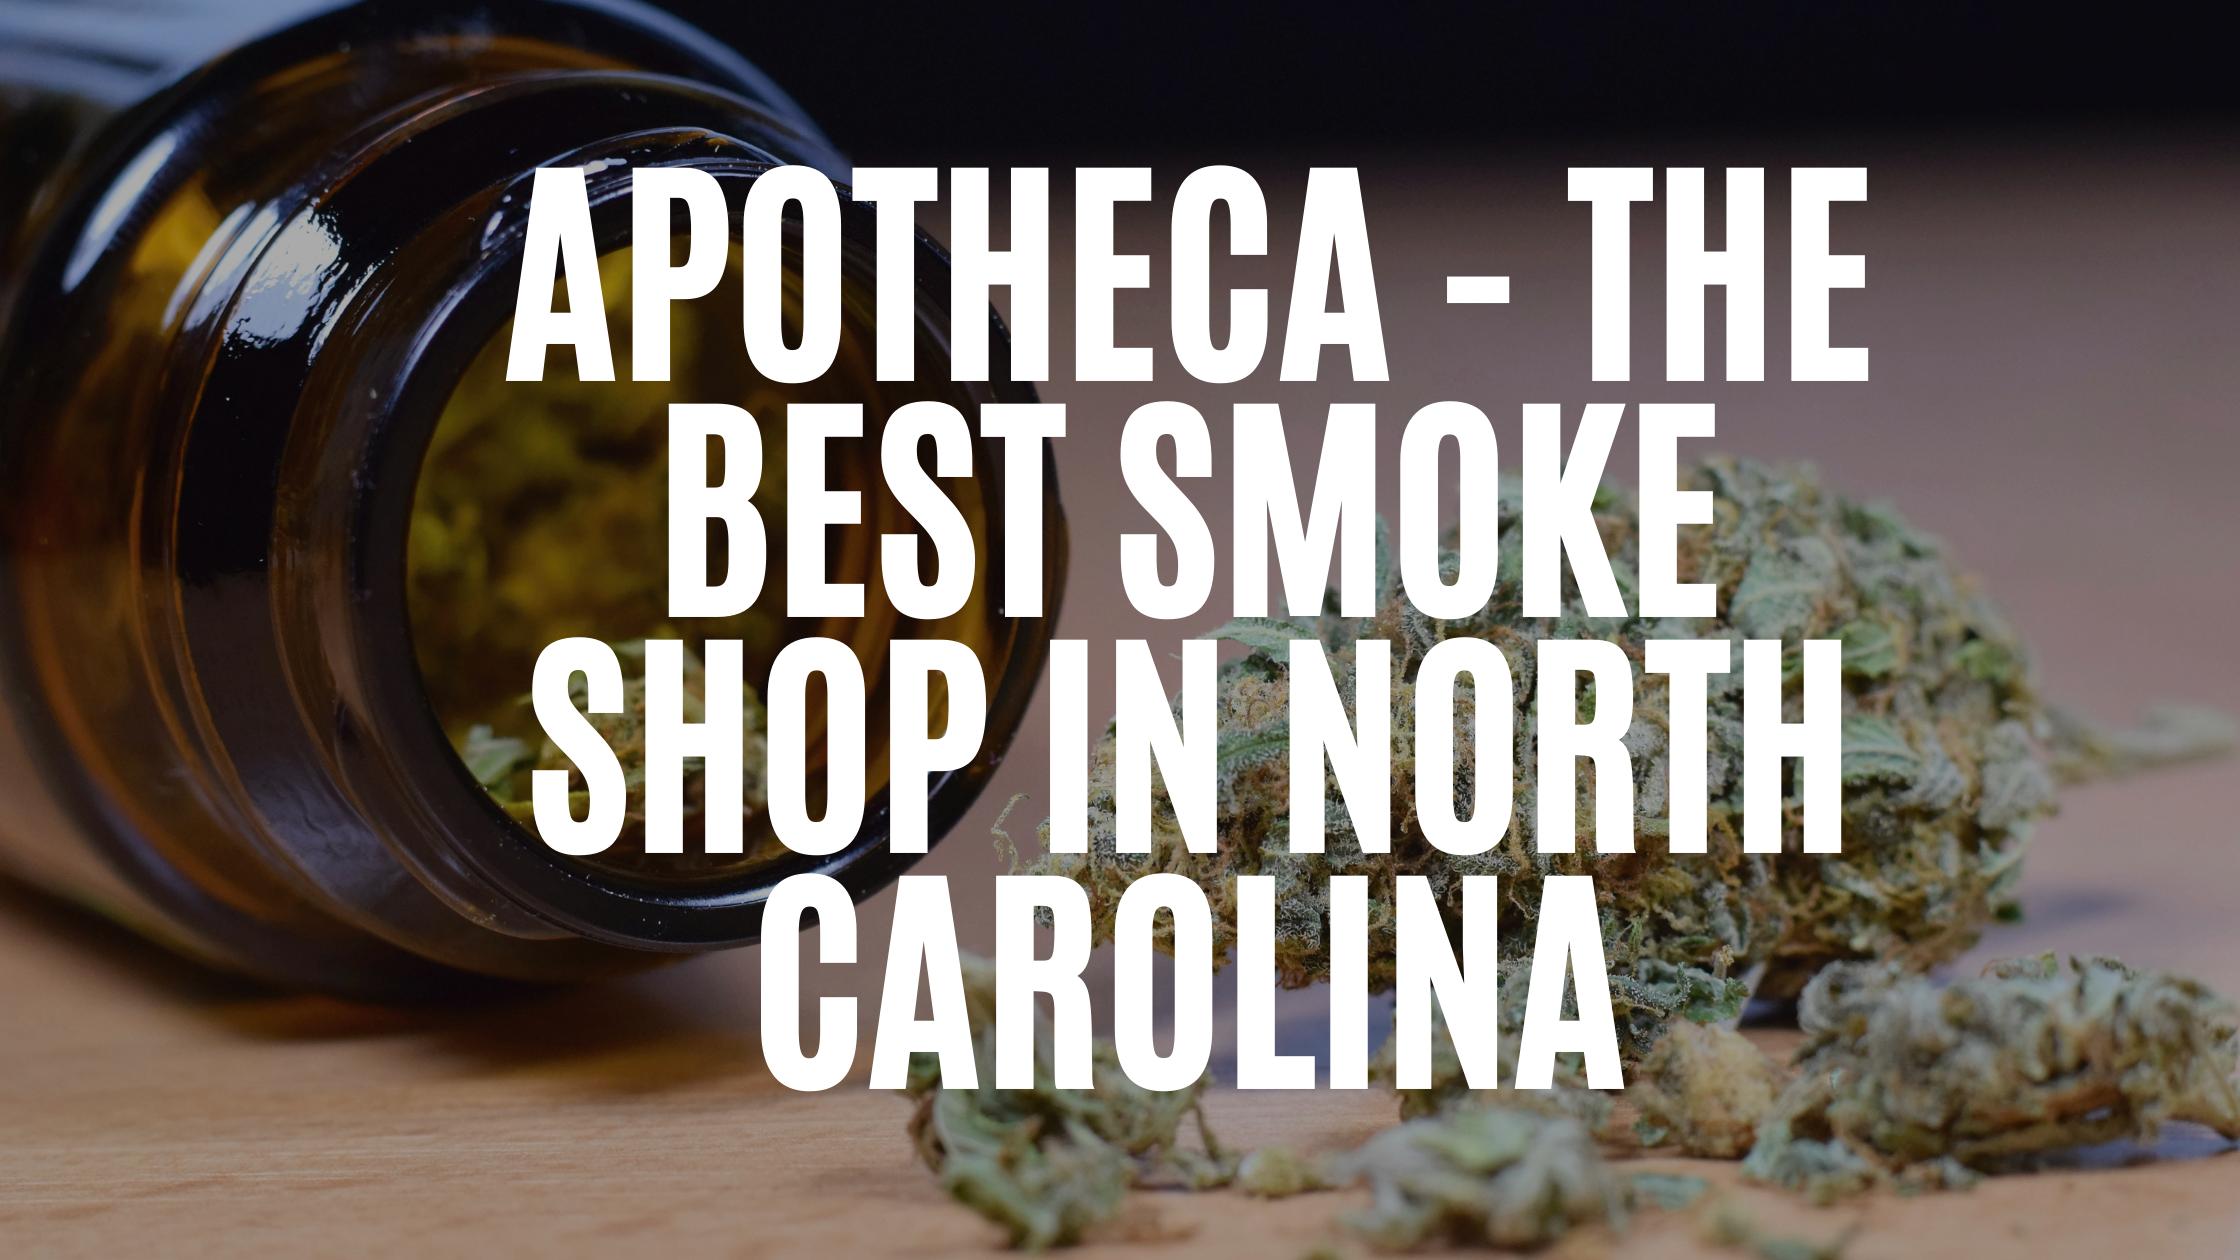 Apotheca - The Best Smoke Shop in North Carolina